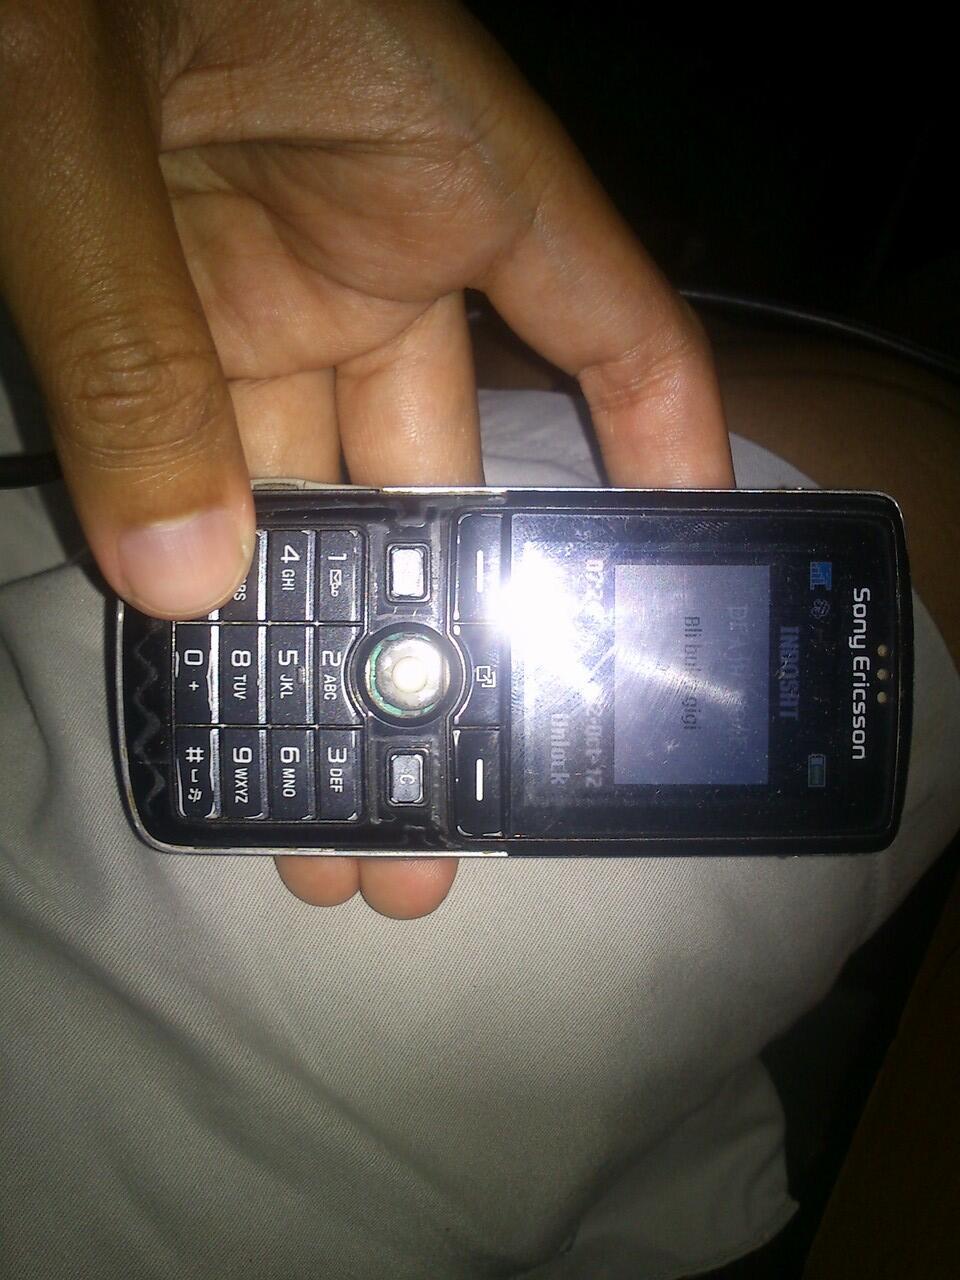 Obral Nokia 3310 c, Soner K750i, Smartfren Andro Hisense e910 Jogja-Yogya